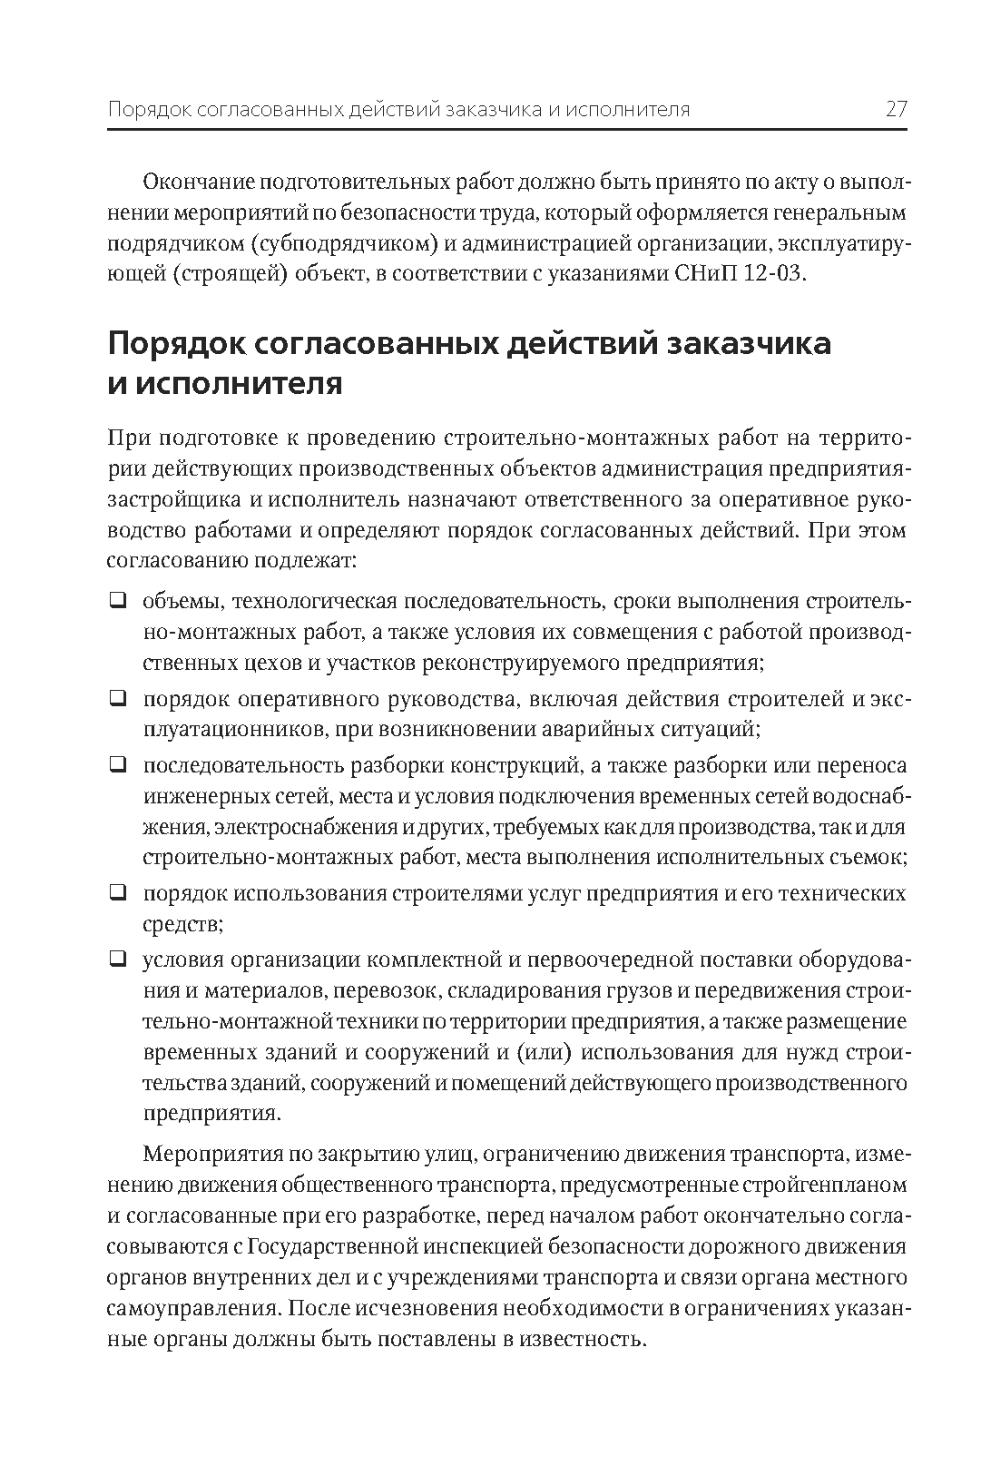 http://i6.imageban.ru/out/2013/11/04/553f97c4b1a38f6d35d0aa32256e4b13.jpg